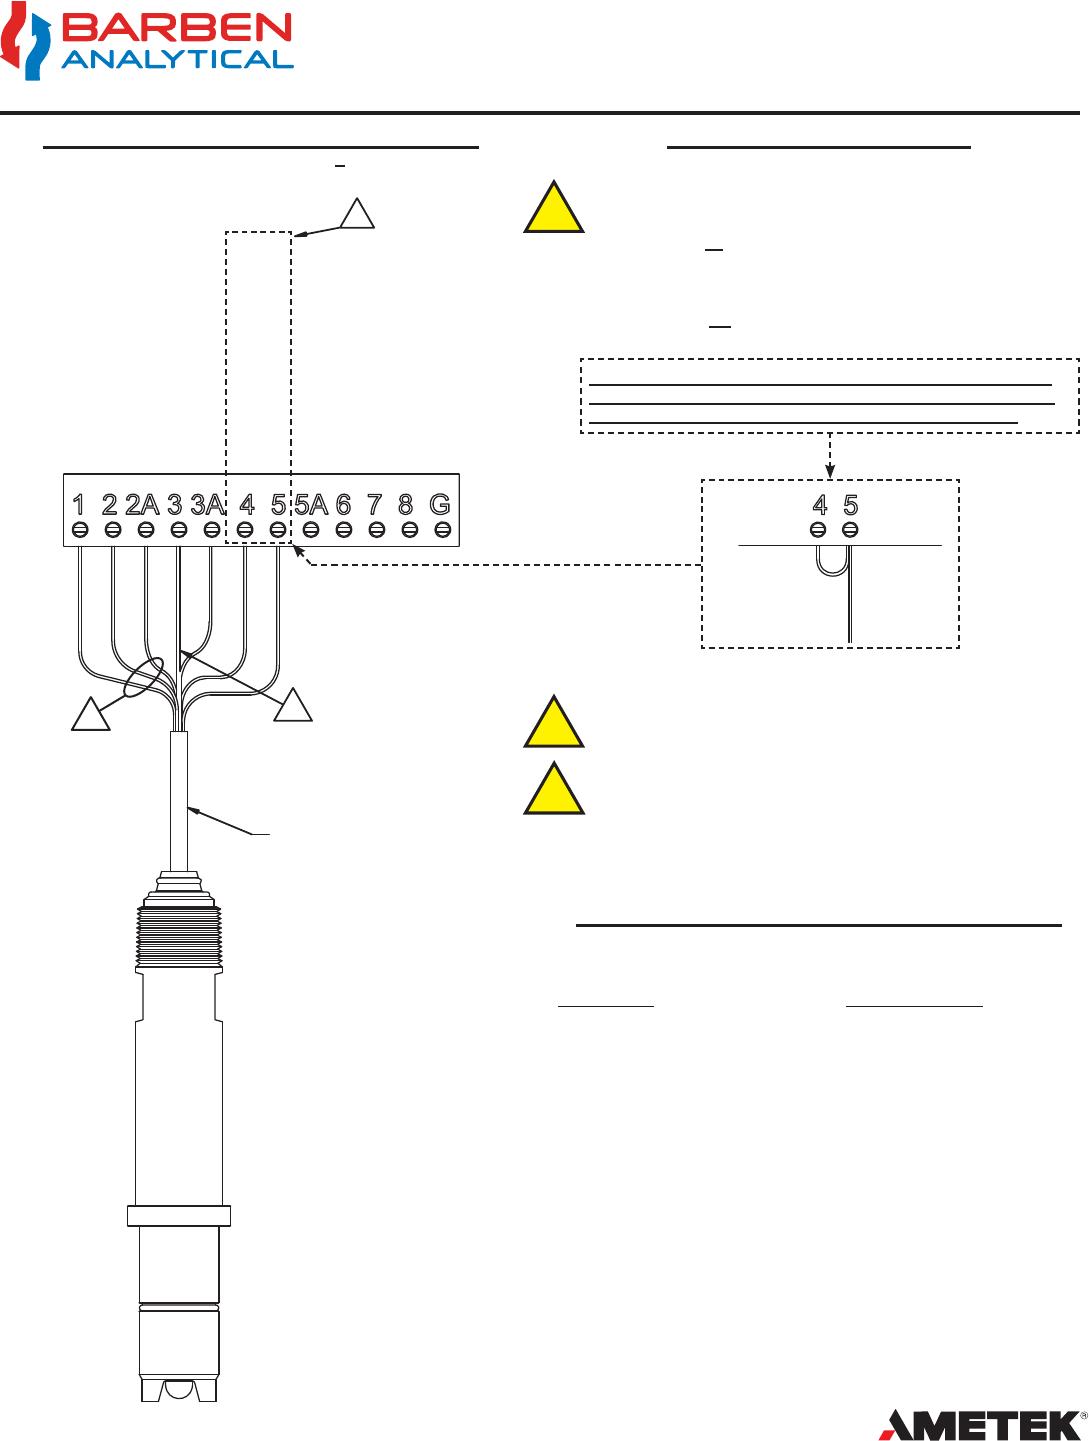 [DIAGRAM_1JK]  Wiring Diagram Foxboro (Invensys) 870ITPH   Invensys Wiring Diagram      DOKUMEN.TIPS